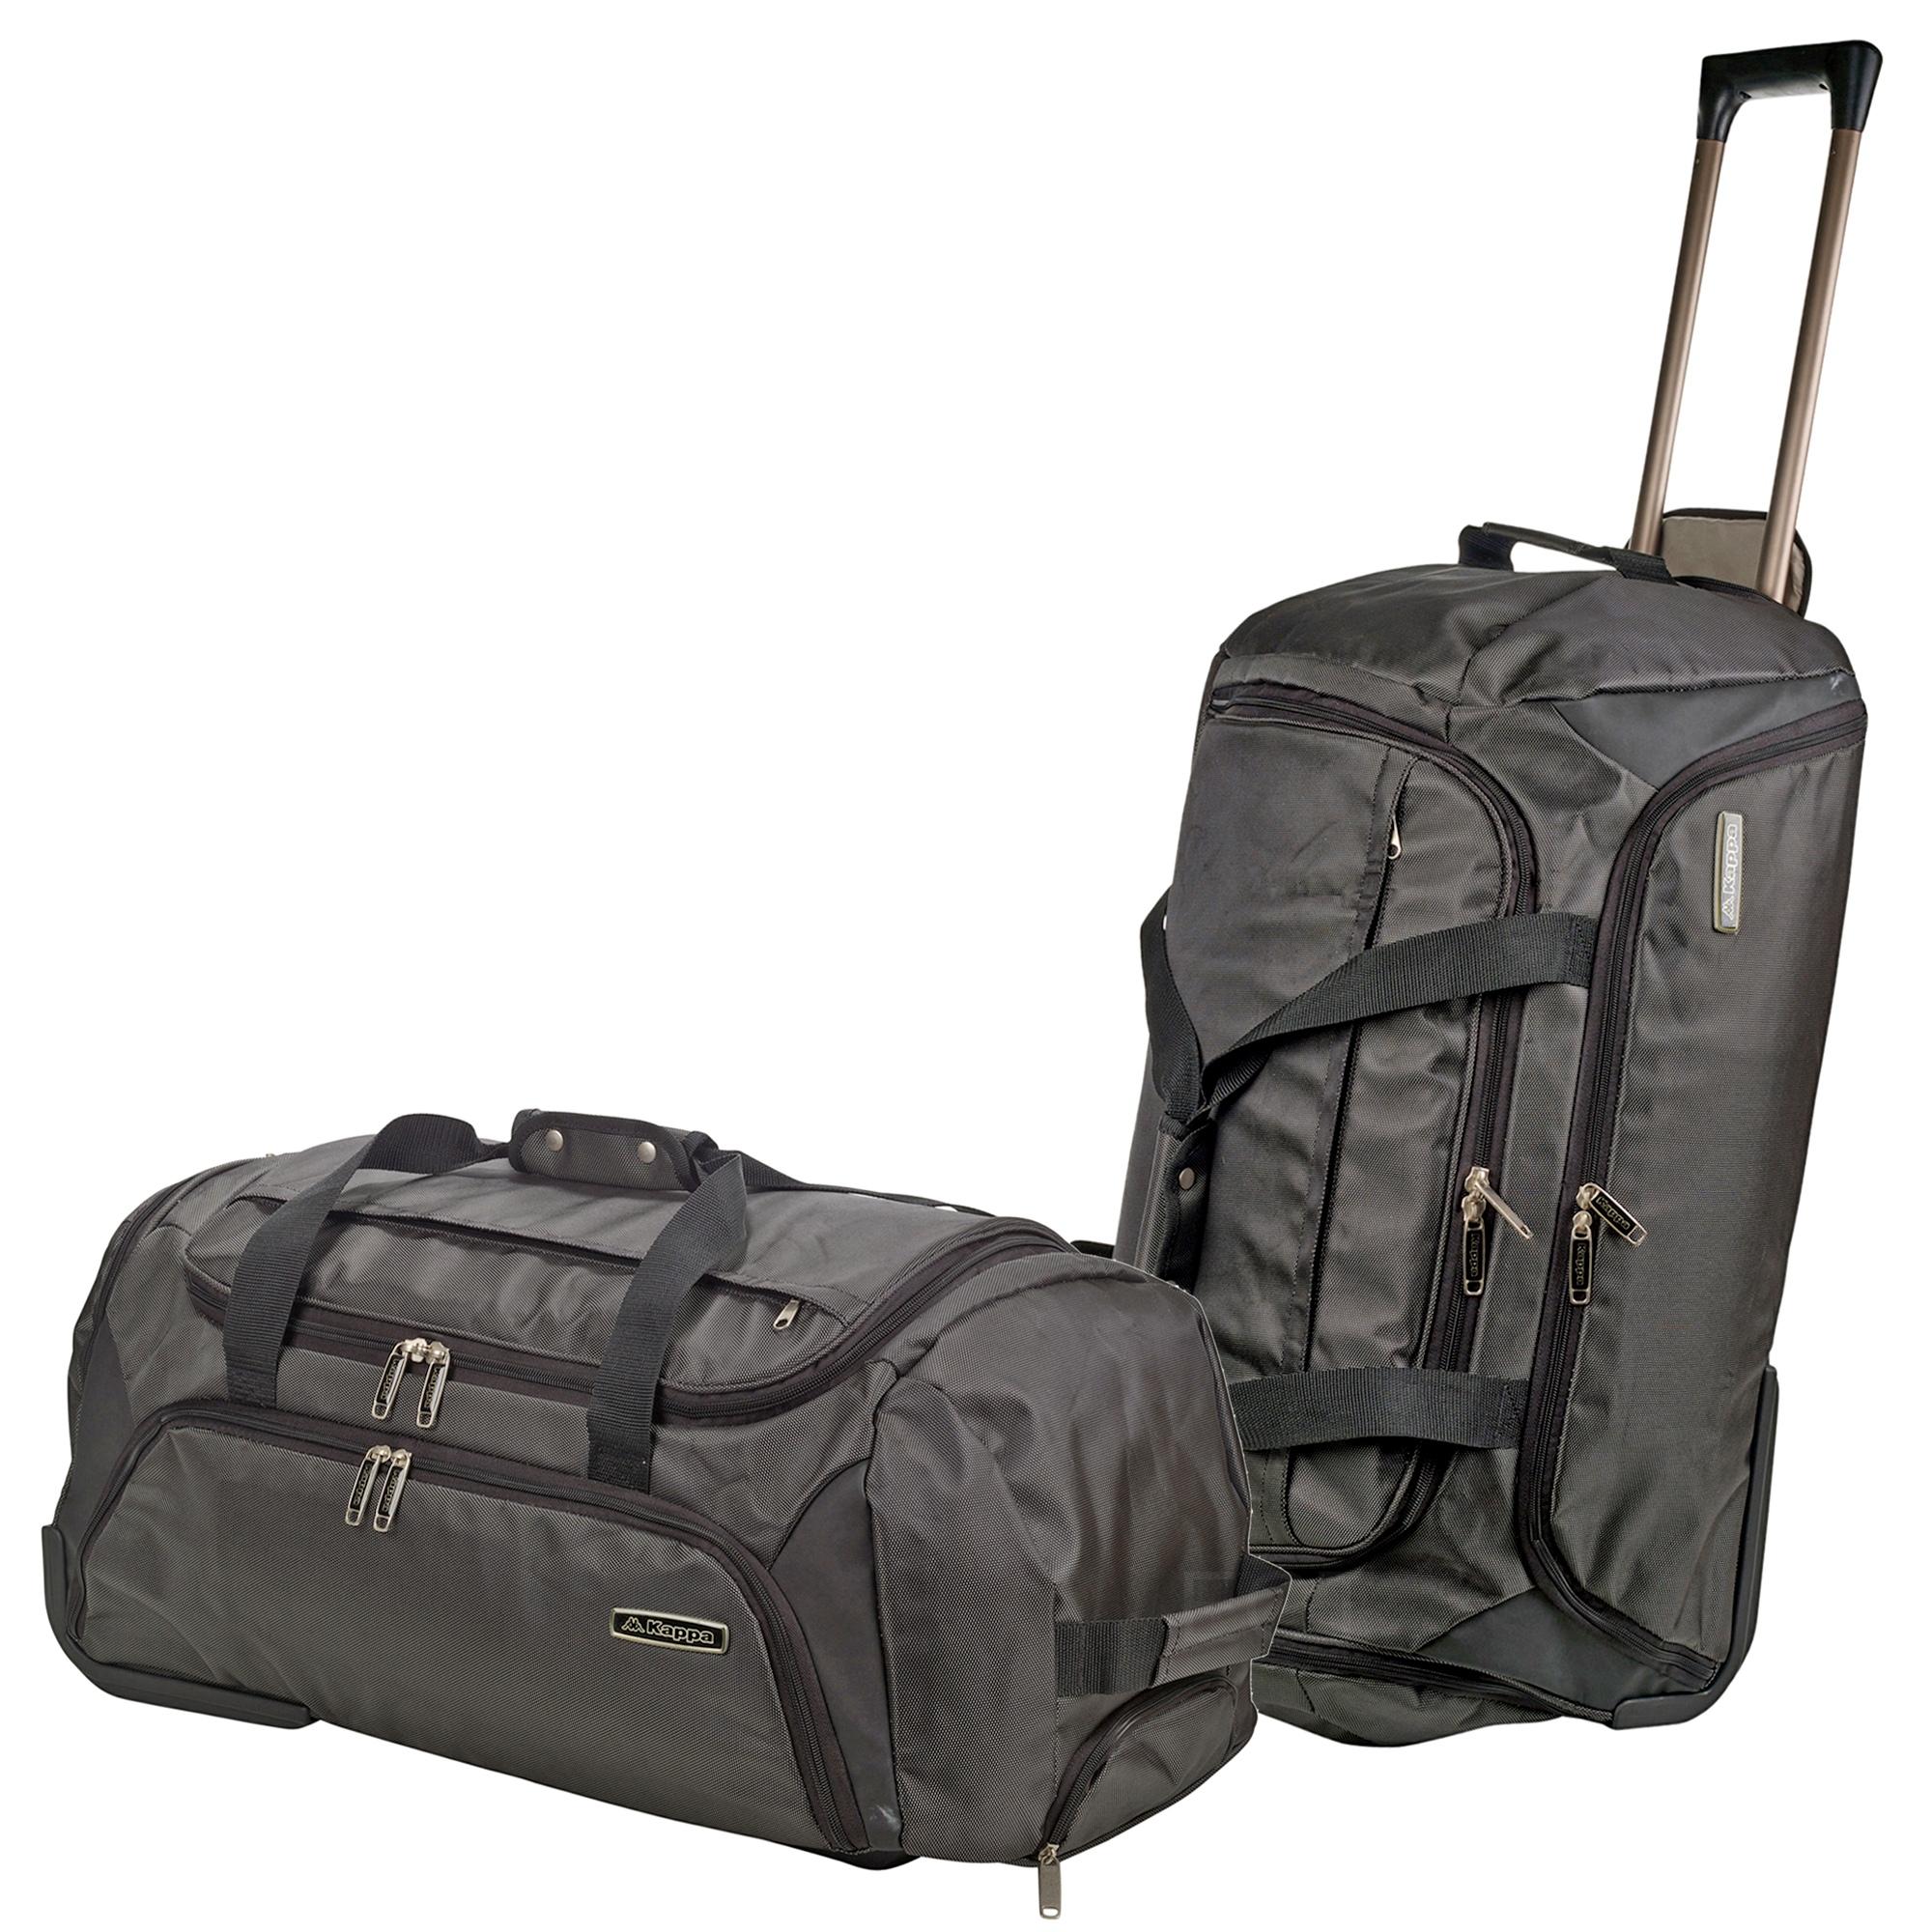 Kappa Travel Bag With Wheels